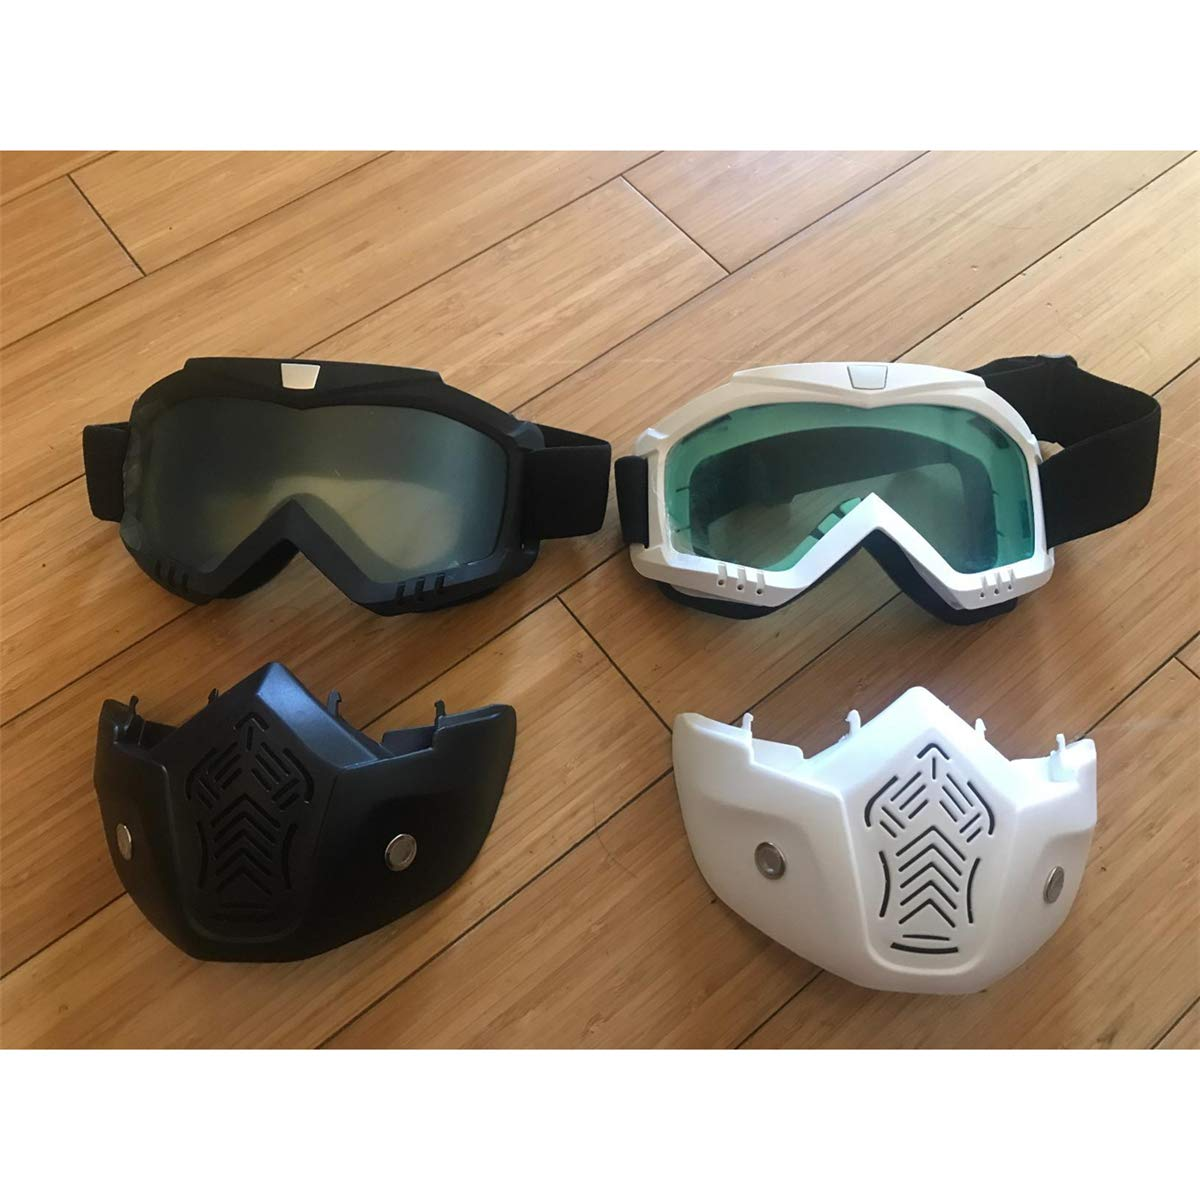 motocicleta TacticaL Mask compatible con Nref Blasters Siwetg Paquete de 2 m/áscaras faciales